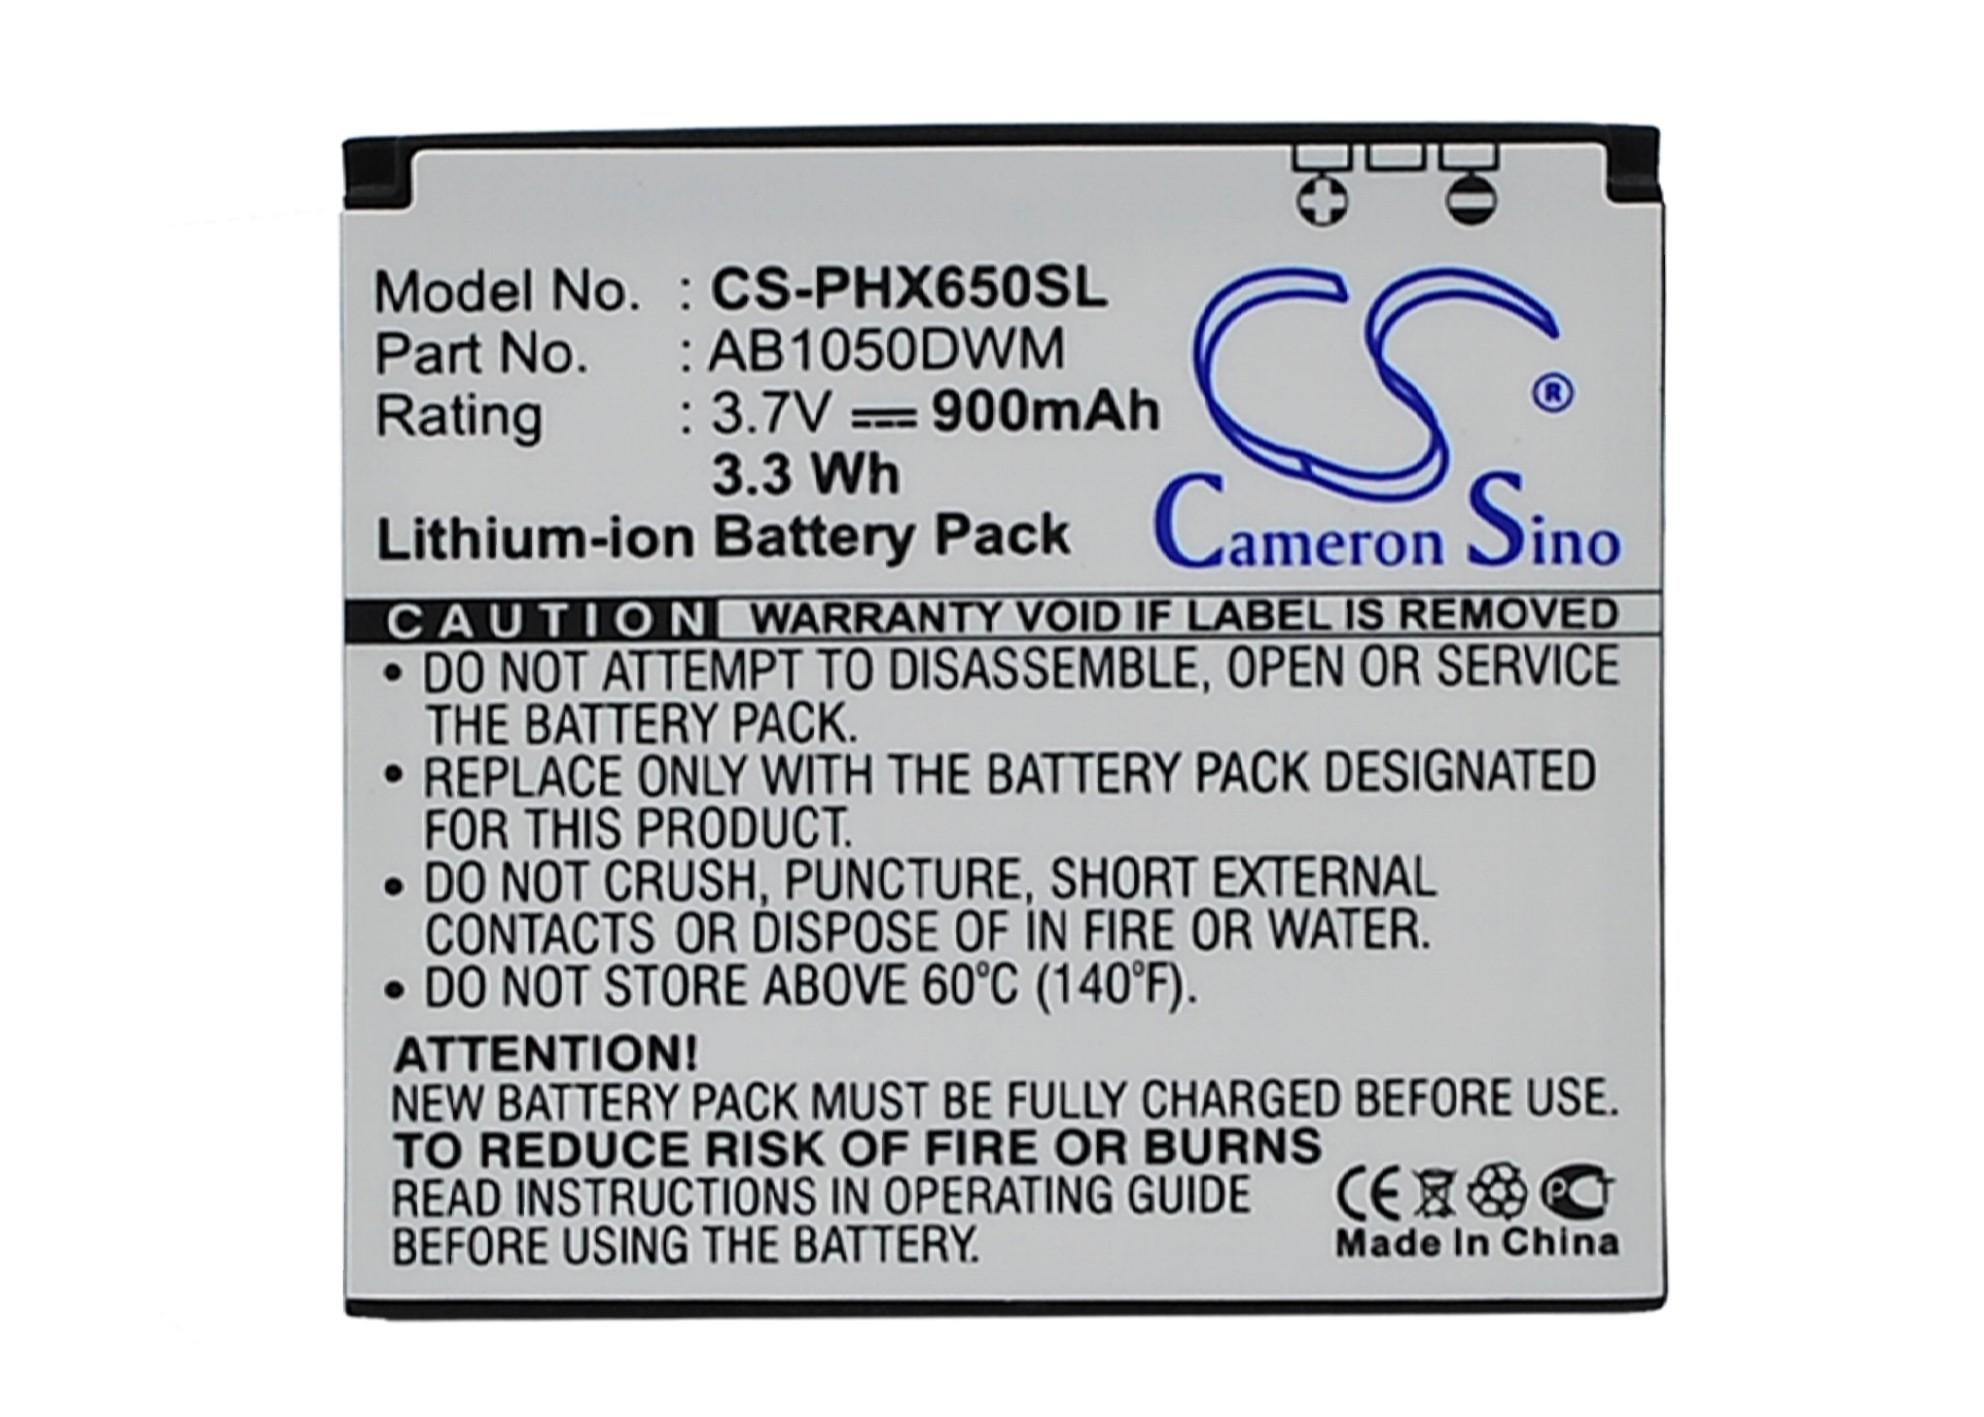 Cameron Sino baterie do mobilů pro PHILIPS Xenium X810 3.7V Li-ion 900mAh černá - neoriginální